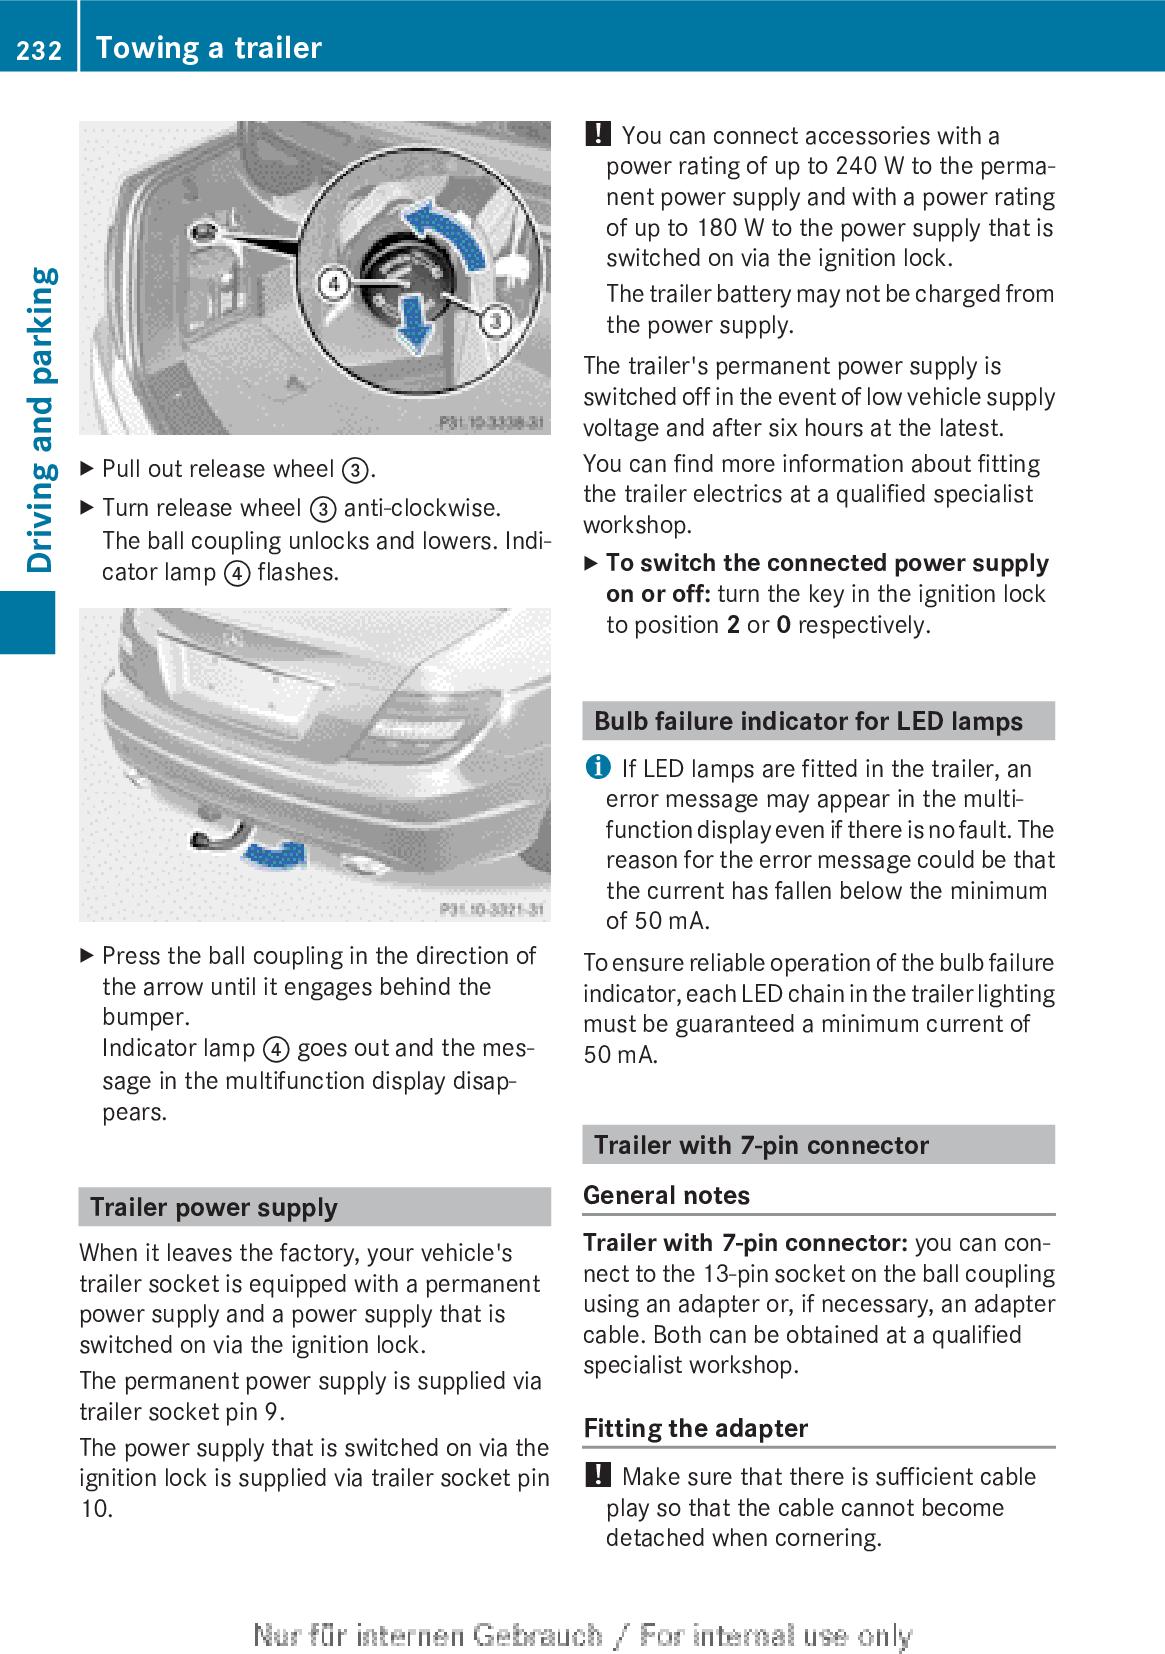 Mercedes Benz 2013 C Class Sedan Uk Version Owners Manual ÿþy